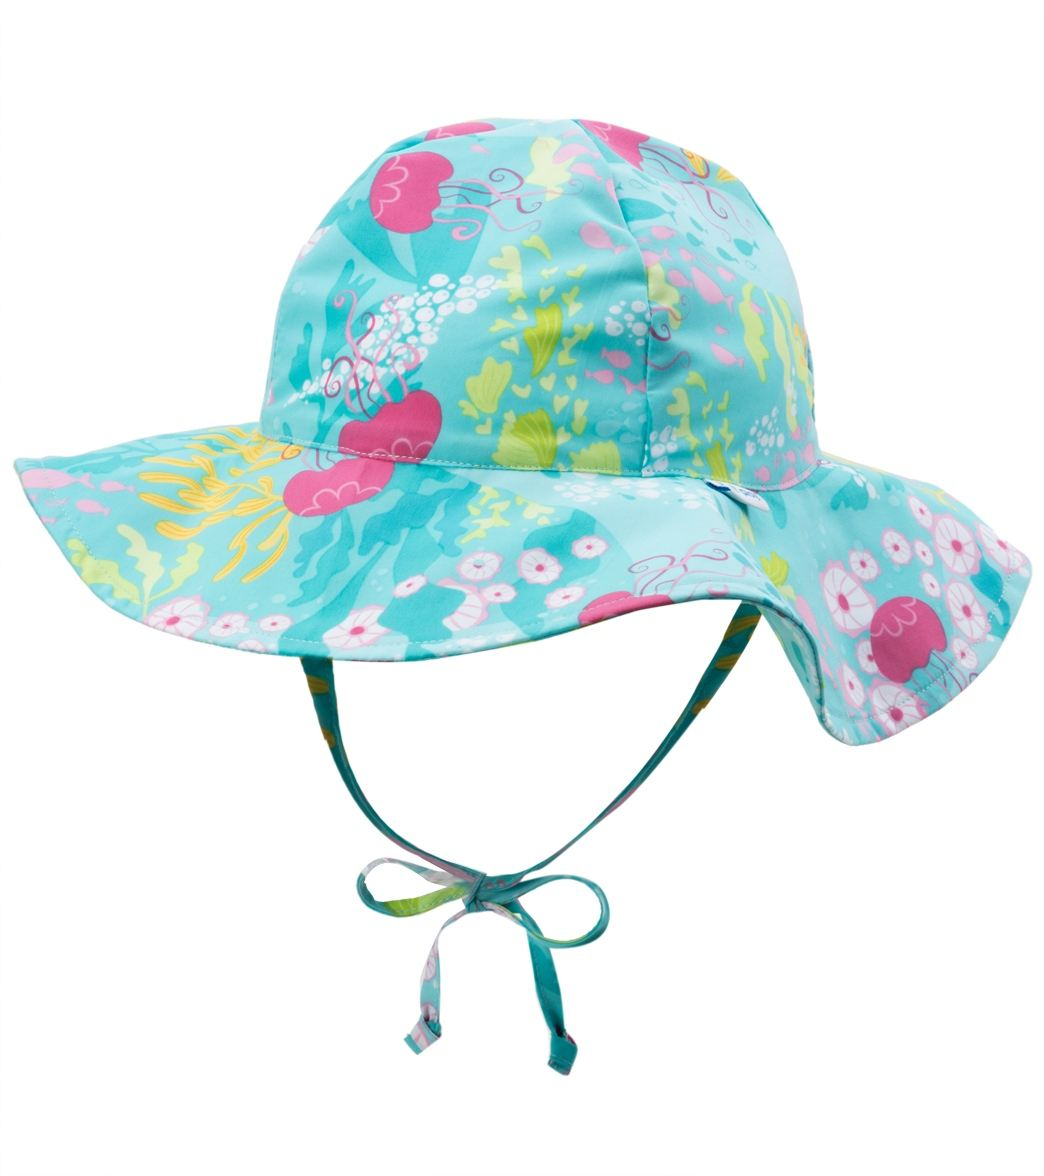 782e2d0c699 iPlay Girls  Luau Classics Brim Sun Protection Hat (0mos-4yrs) at  SwimOutlet.com